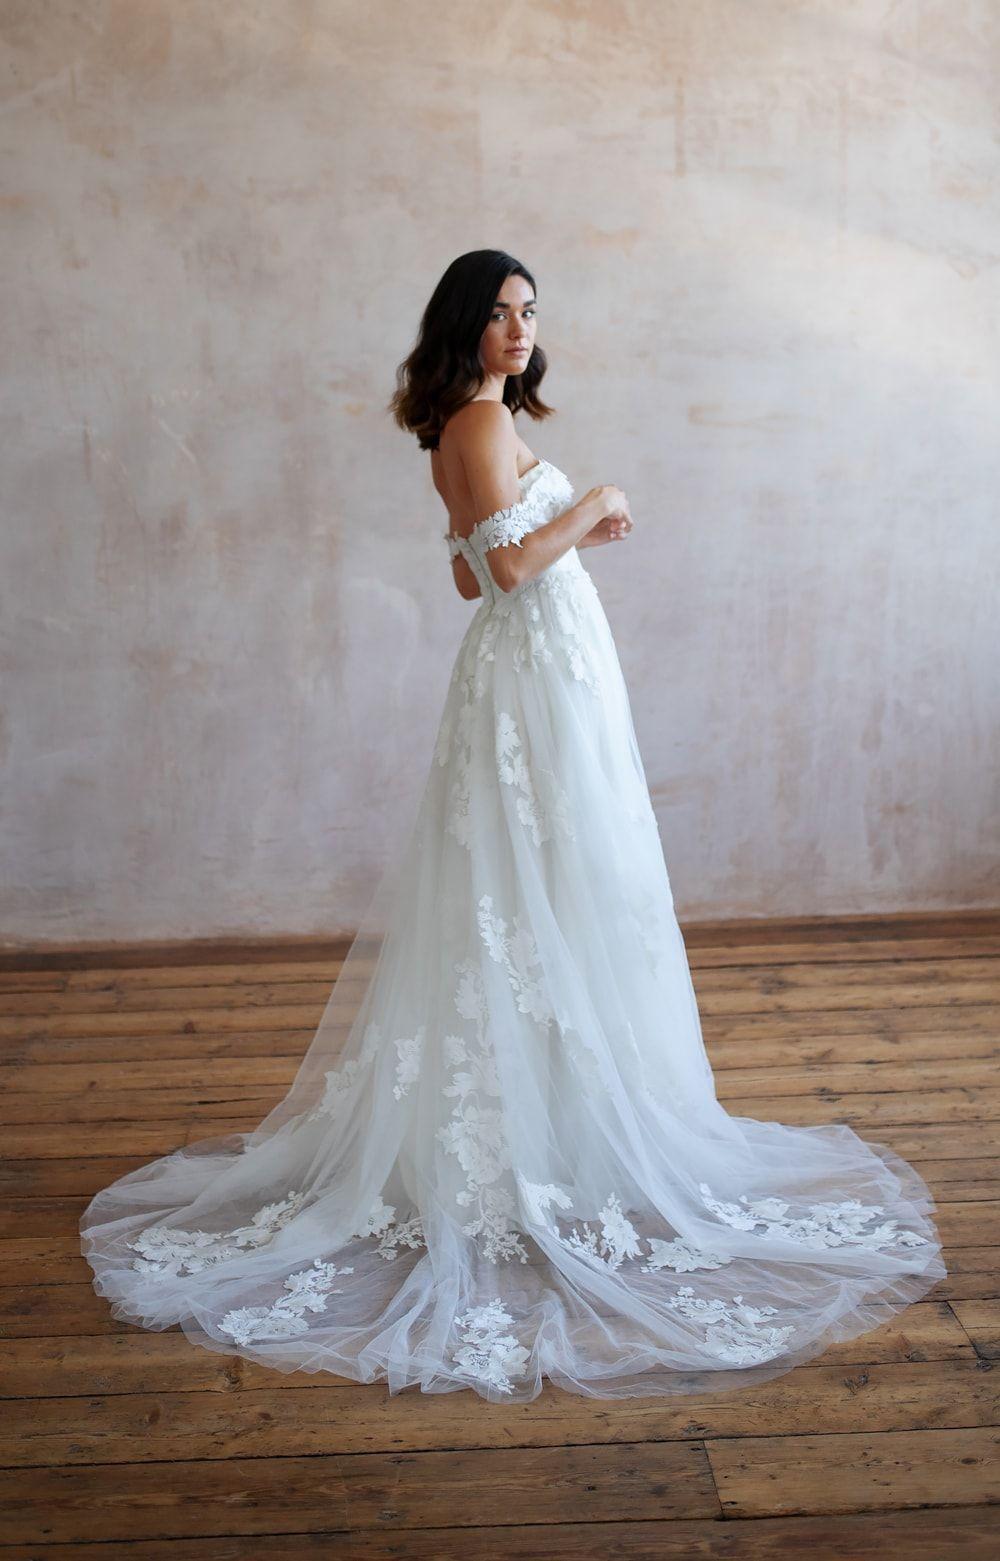 Bridal Shops Near Me Bridal Shops London Wedding Dresses Lace Lace Wedding Dresses Wedding Dress Lace Lace Wedding Dress Wedding Dresses Boho Wedding Dress 9 5